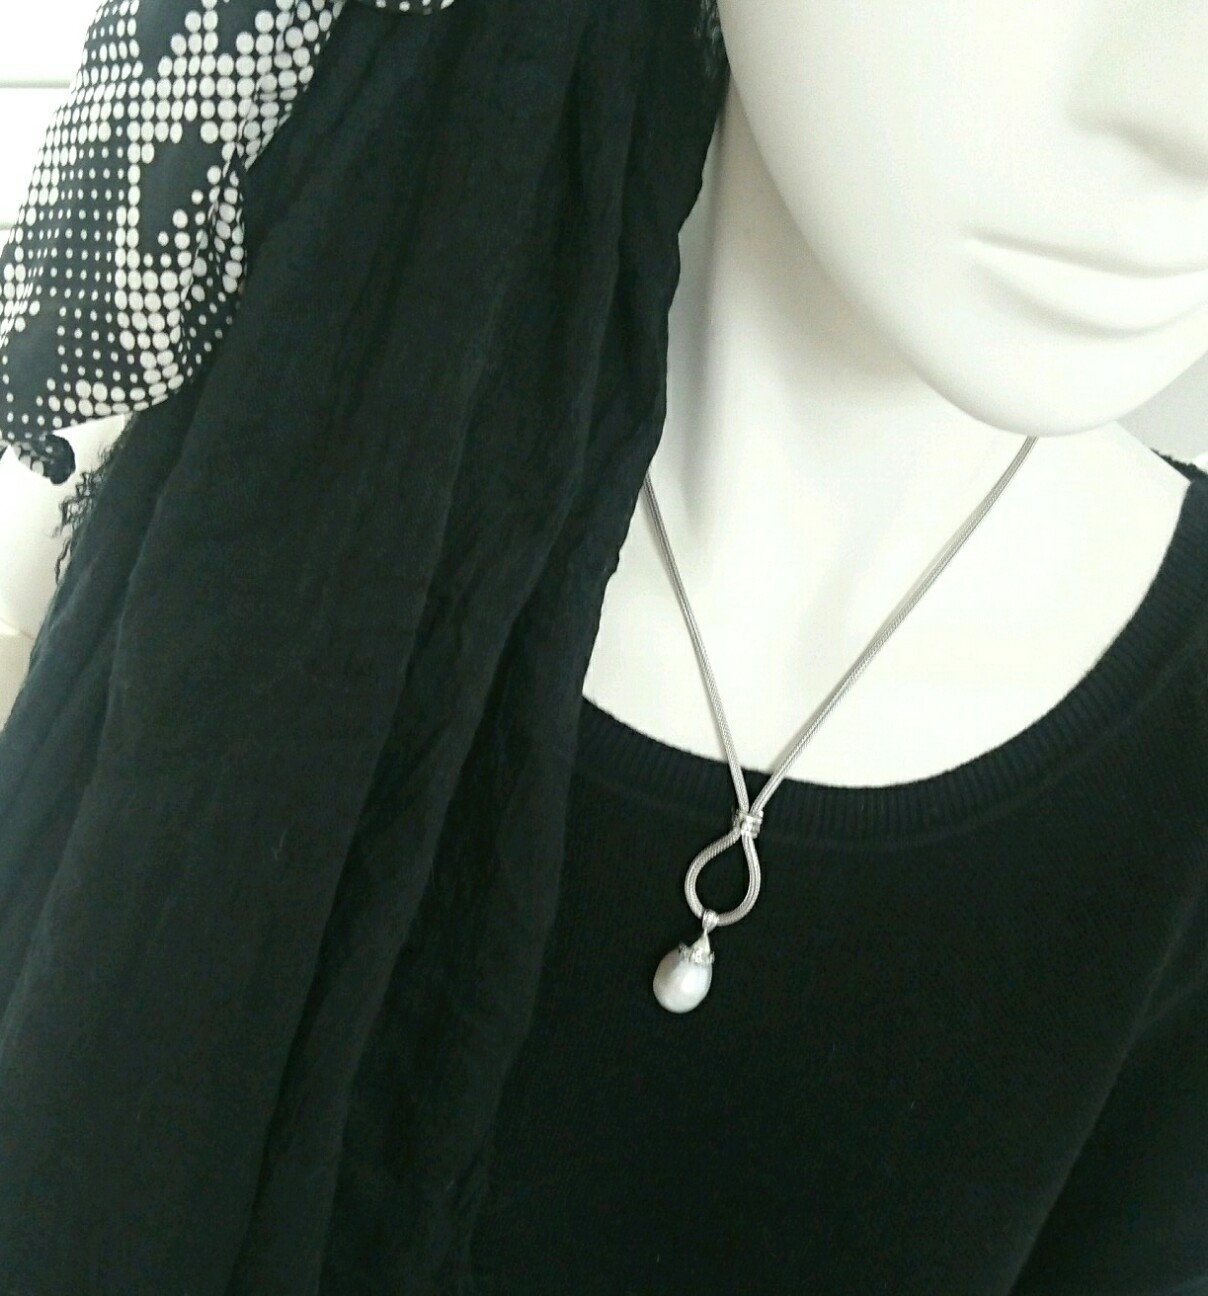 f:id:akira1007:20170313064014j:image